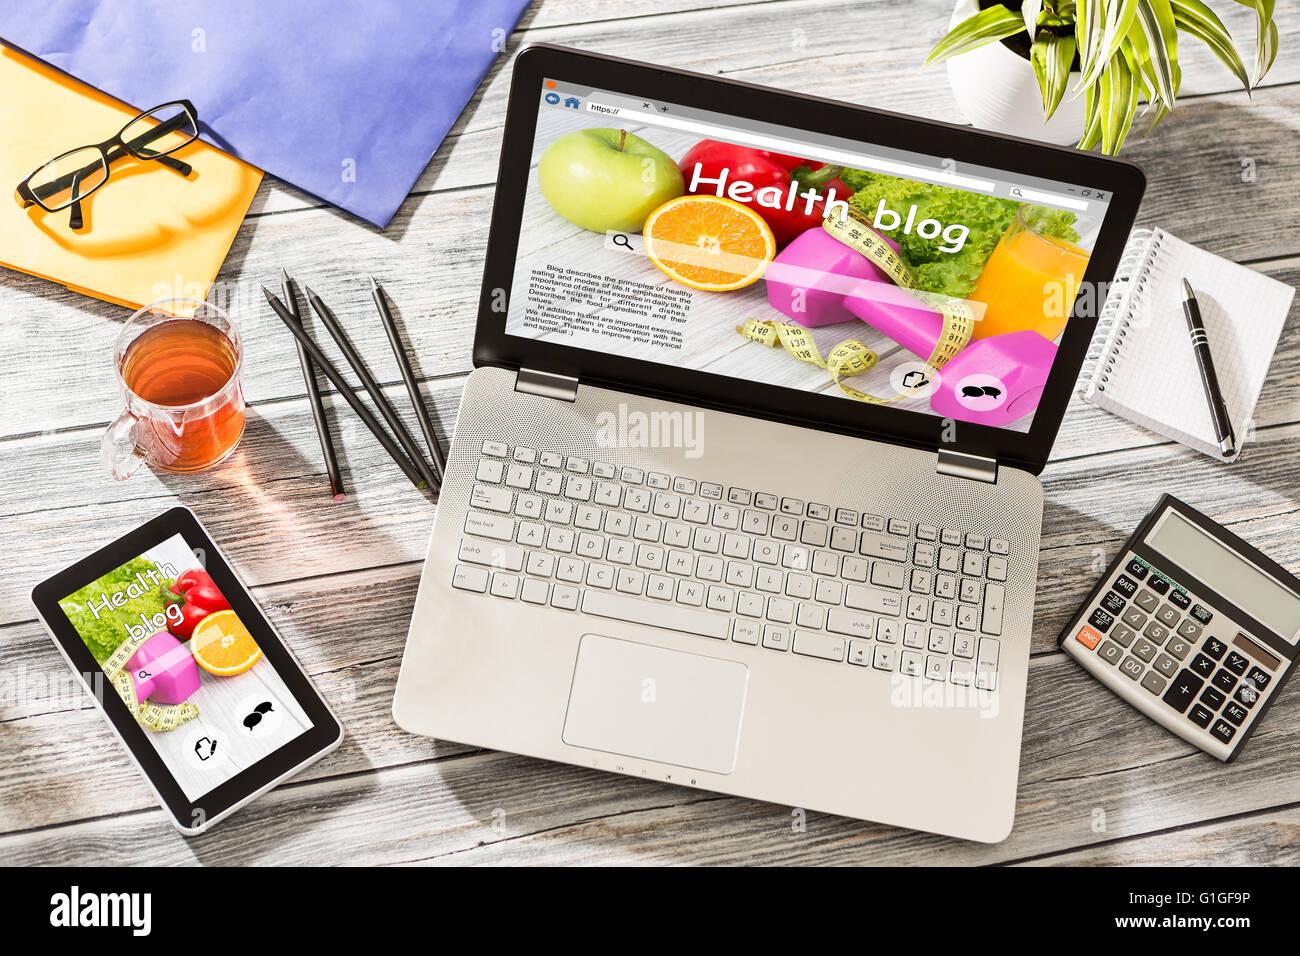 Blog Weblog Media Digital Social Dictionary Online Concept - Stock Image - Stock Image